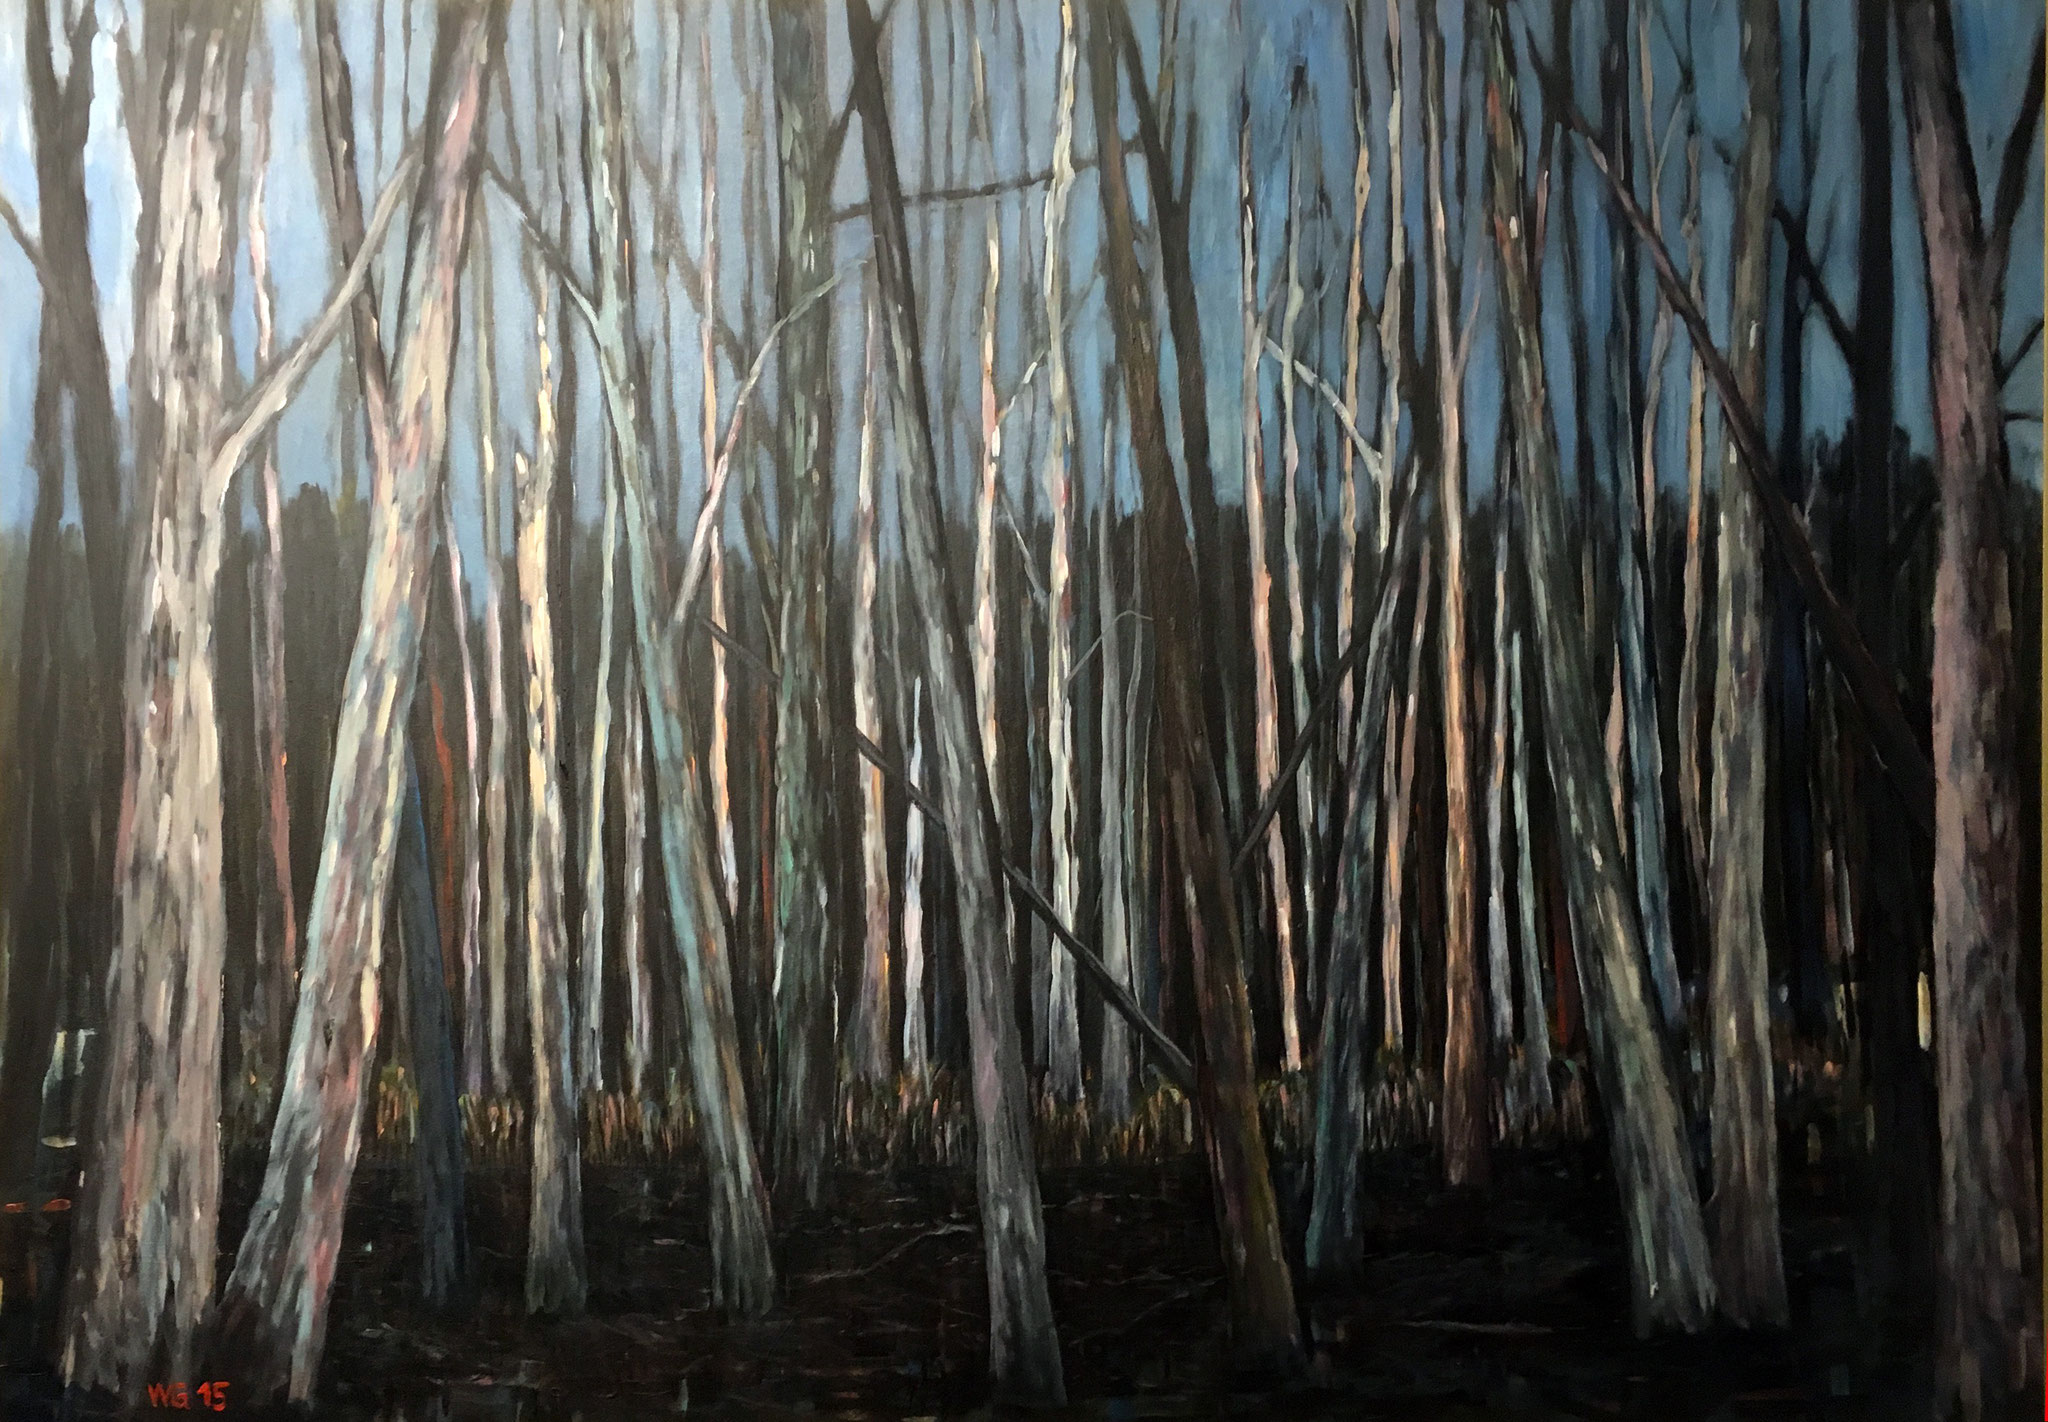 """Relative Trockenheit"", Acryl auf Baumwolle, 100x140, 2015"